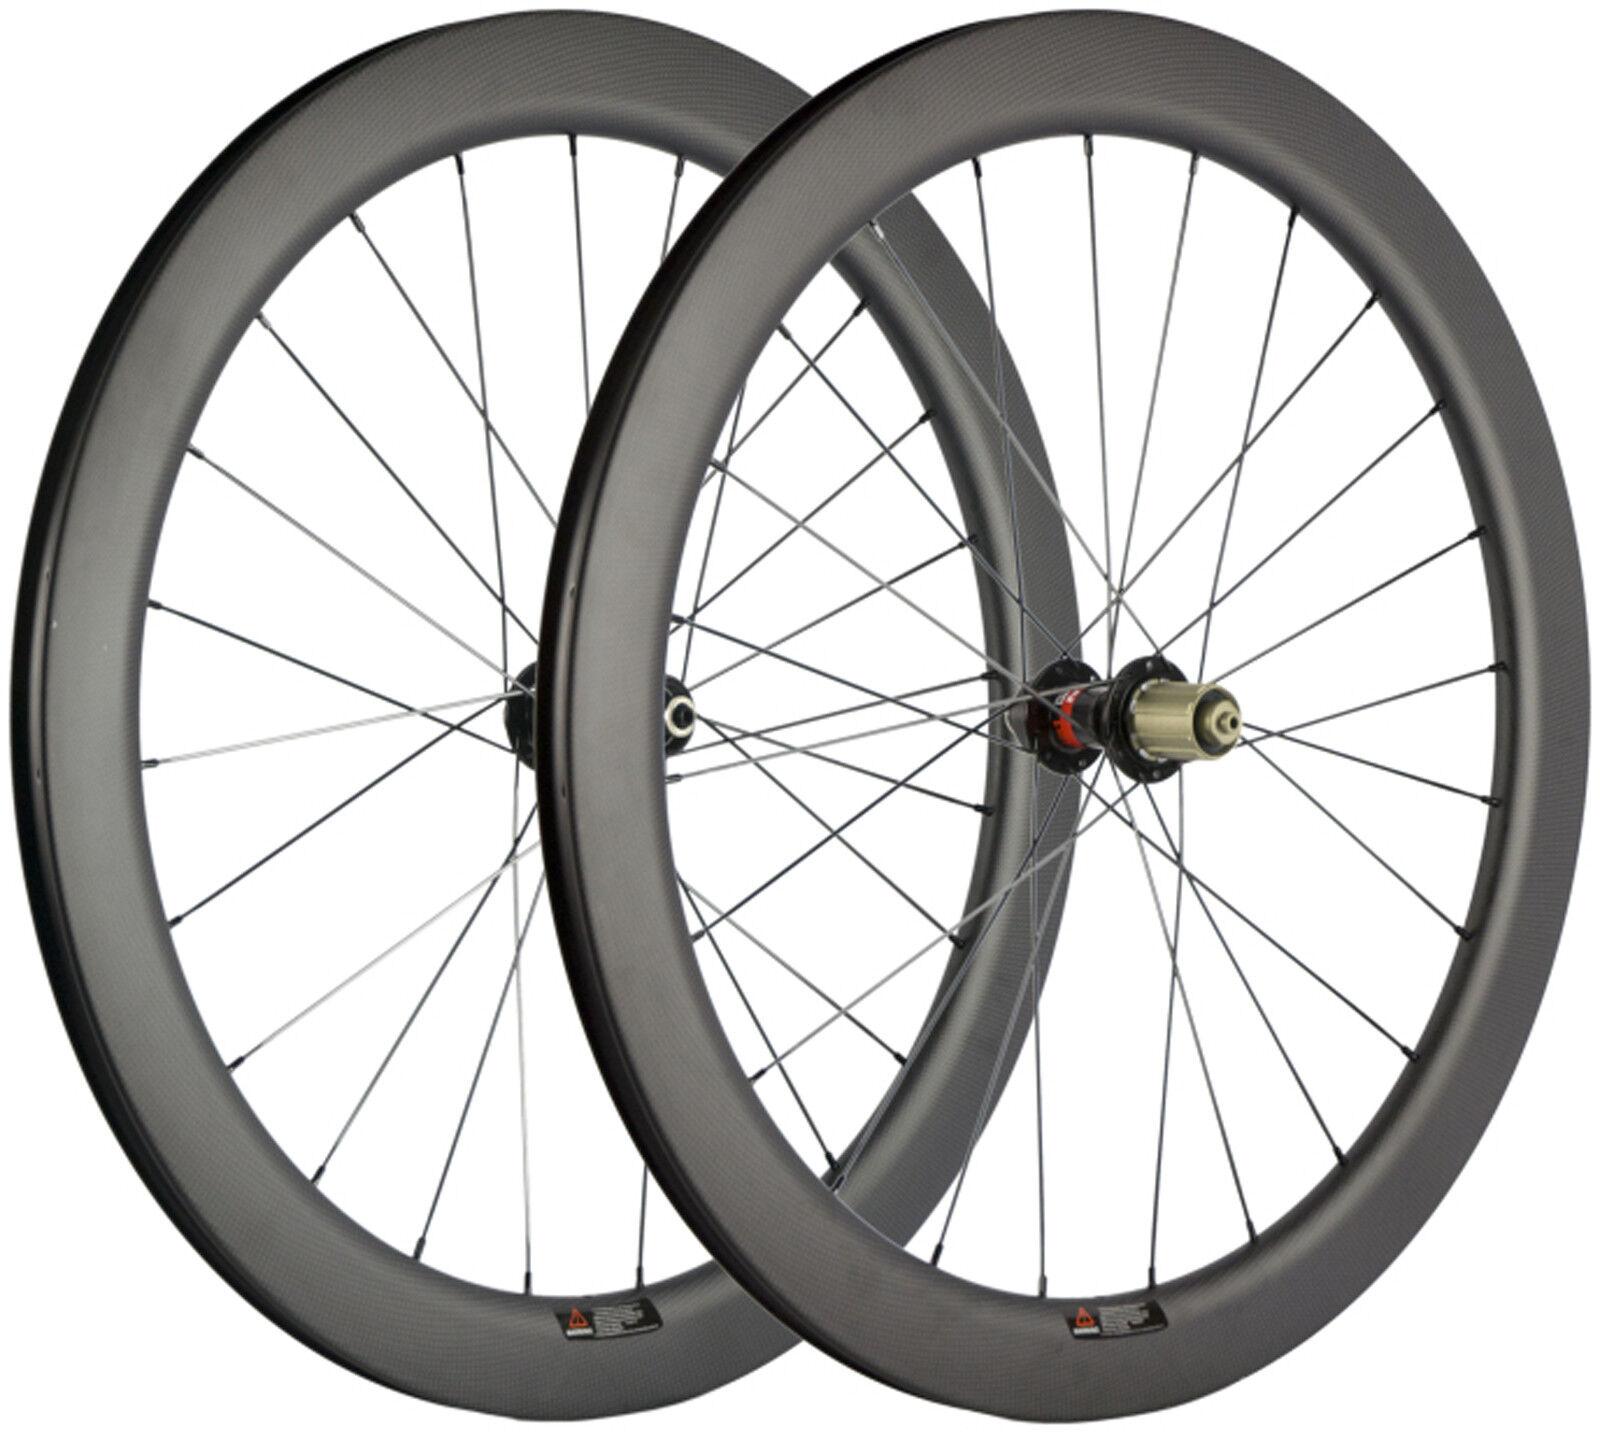 30 40 45 55mm Disc  Brake Carbon Wheels Thru Axle 12mm 15mm QR Bicycle Wheelset  preferential